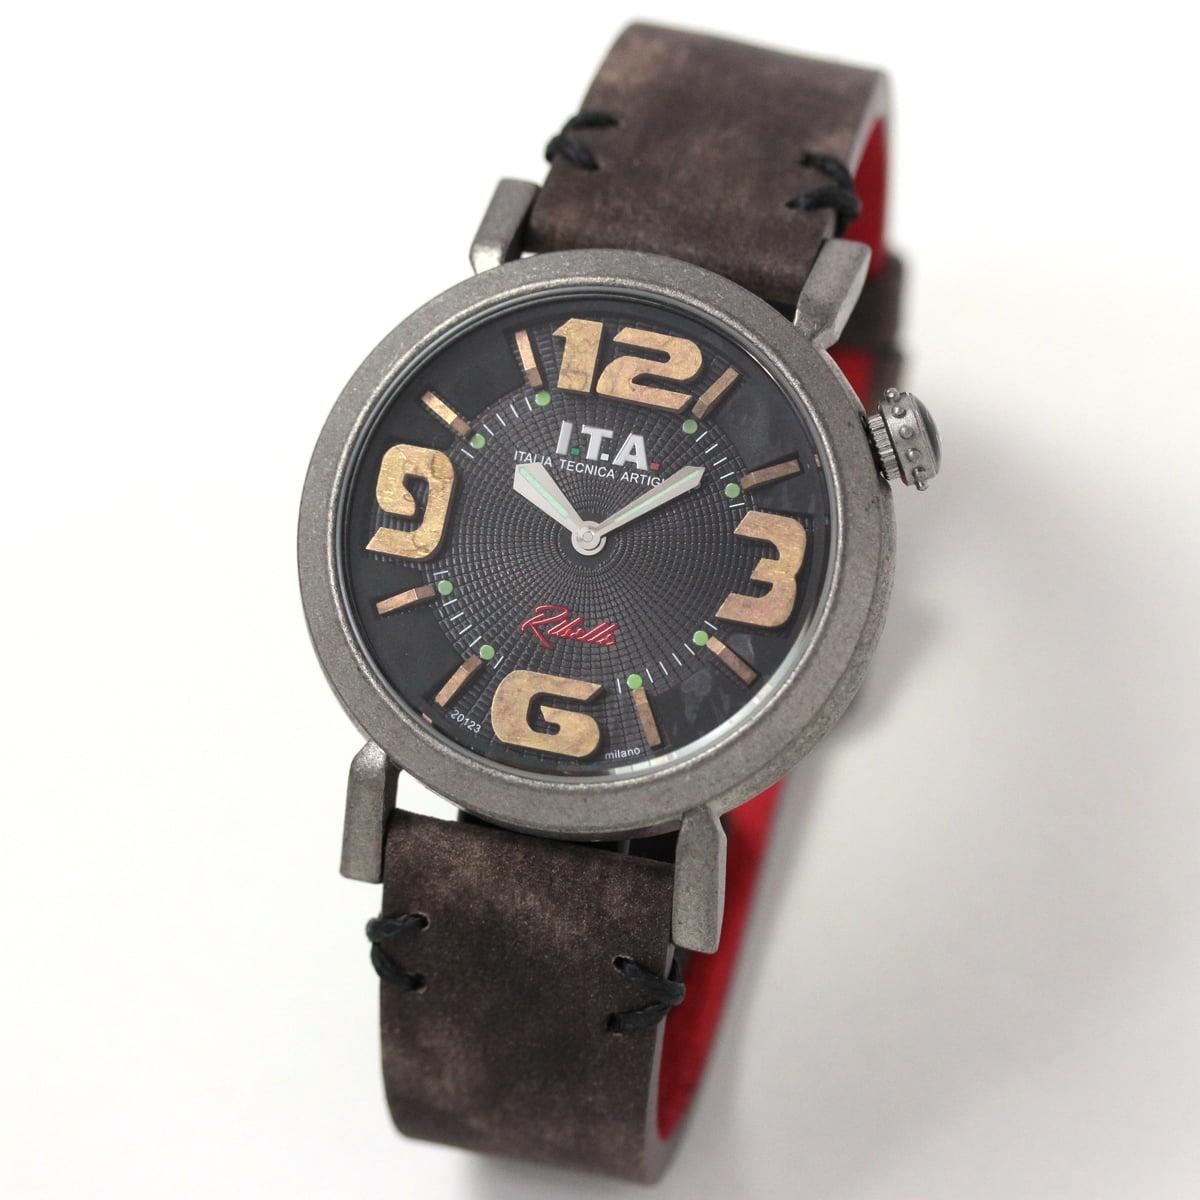 ITA イタリアンウォッチ リベッレ ita220001 腕時計